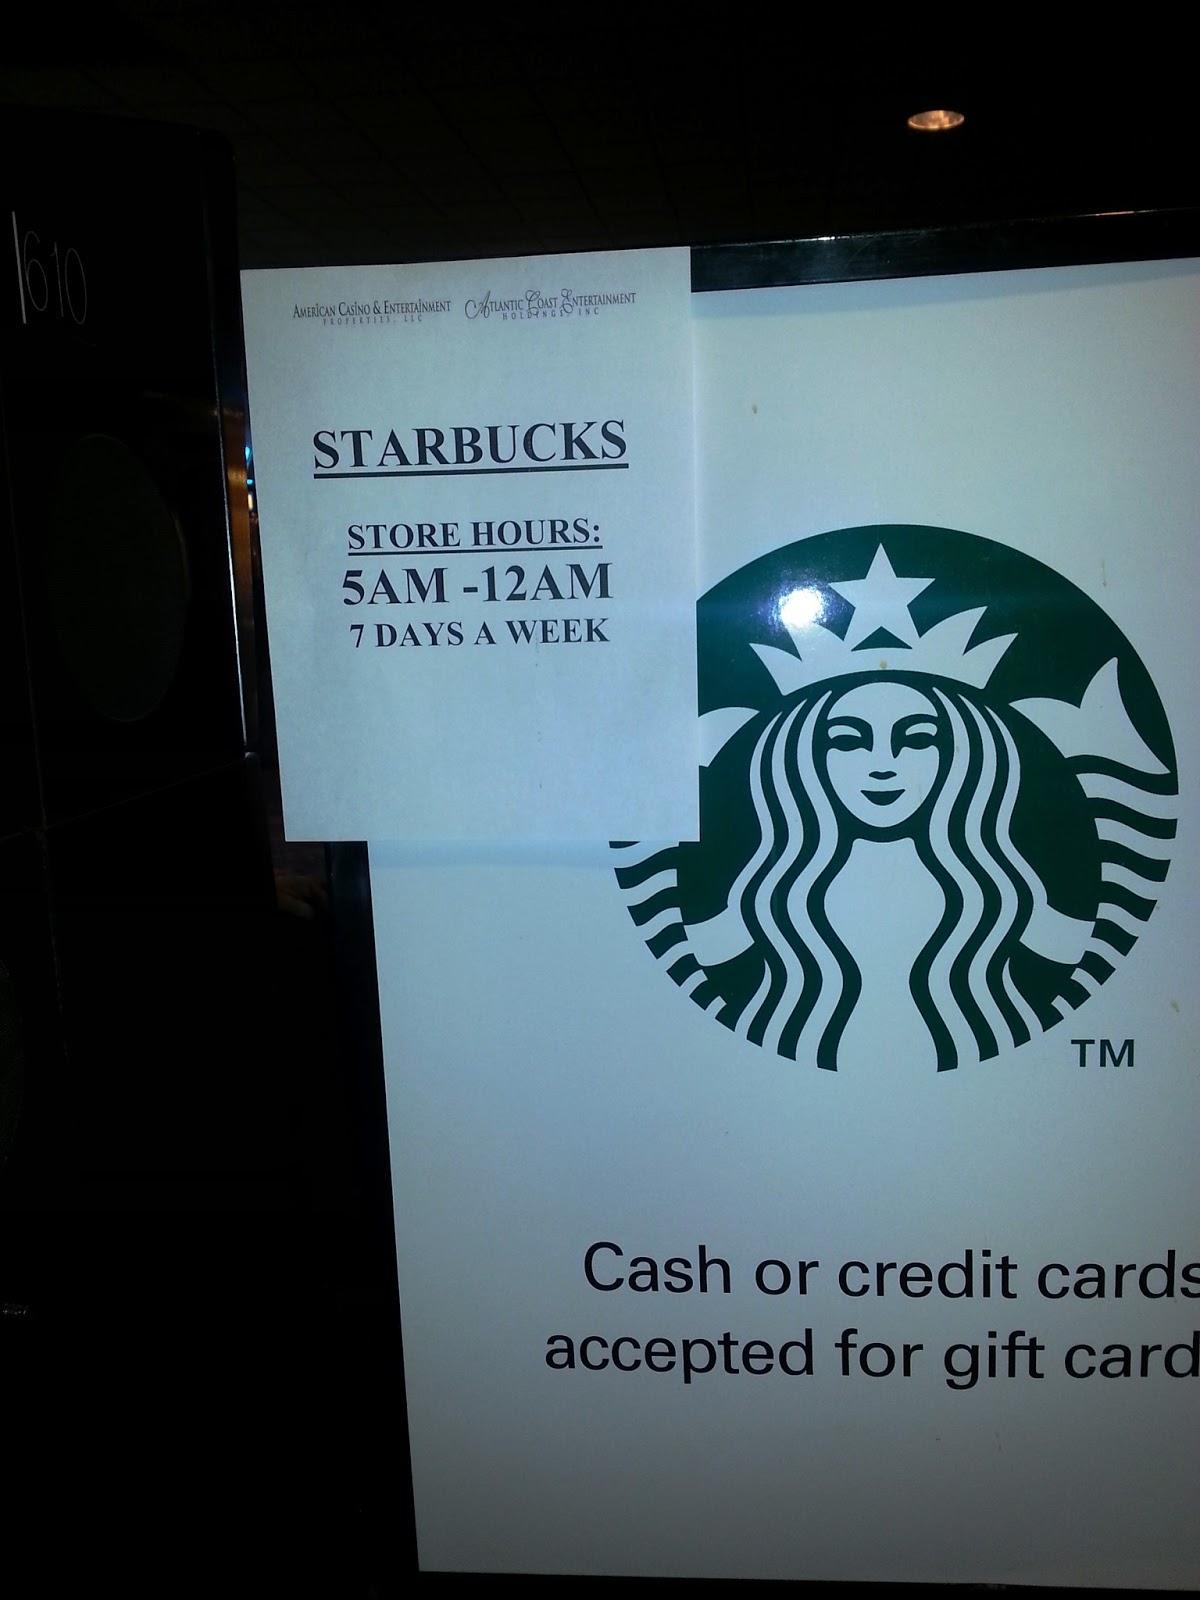 New Hours At The Starbucks In Aquarius